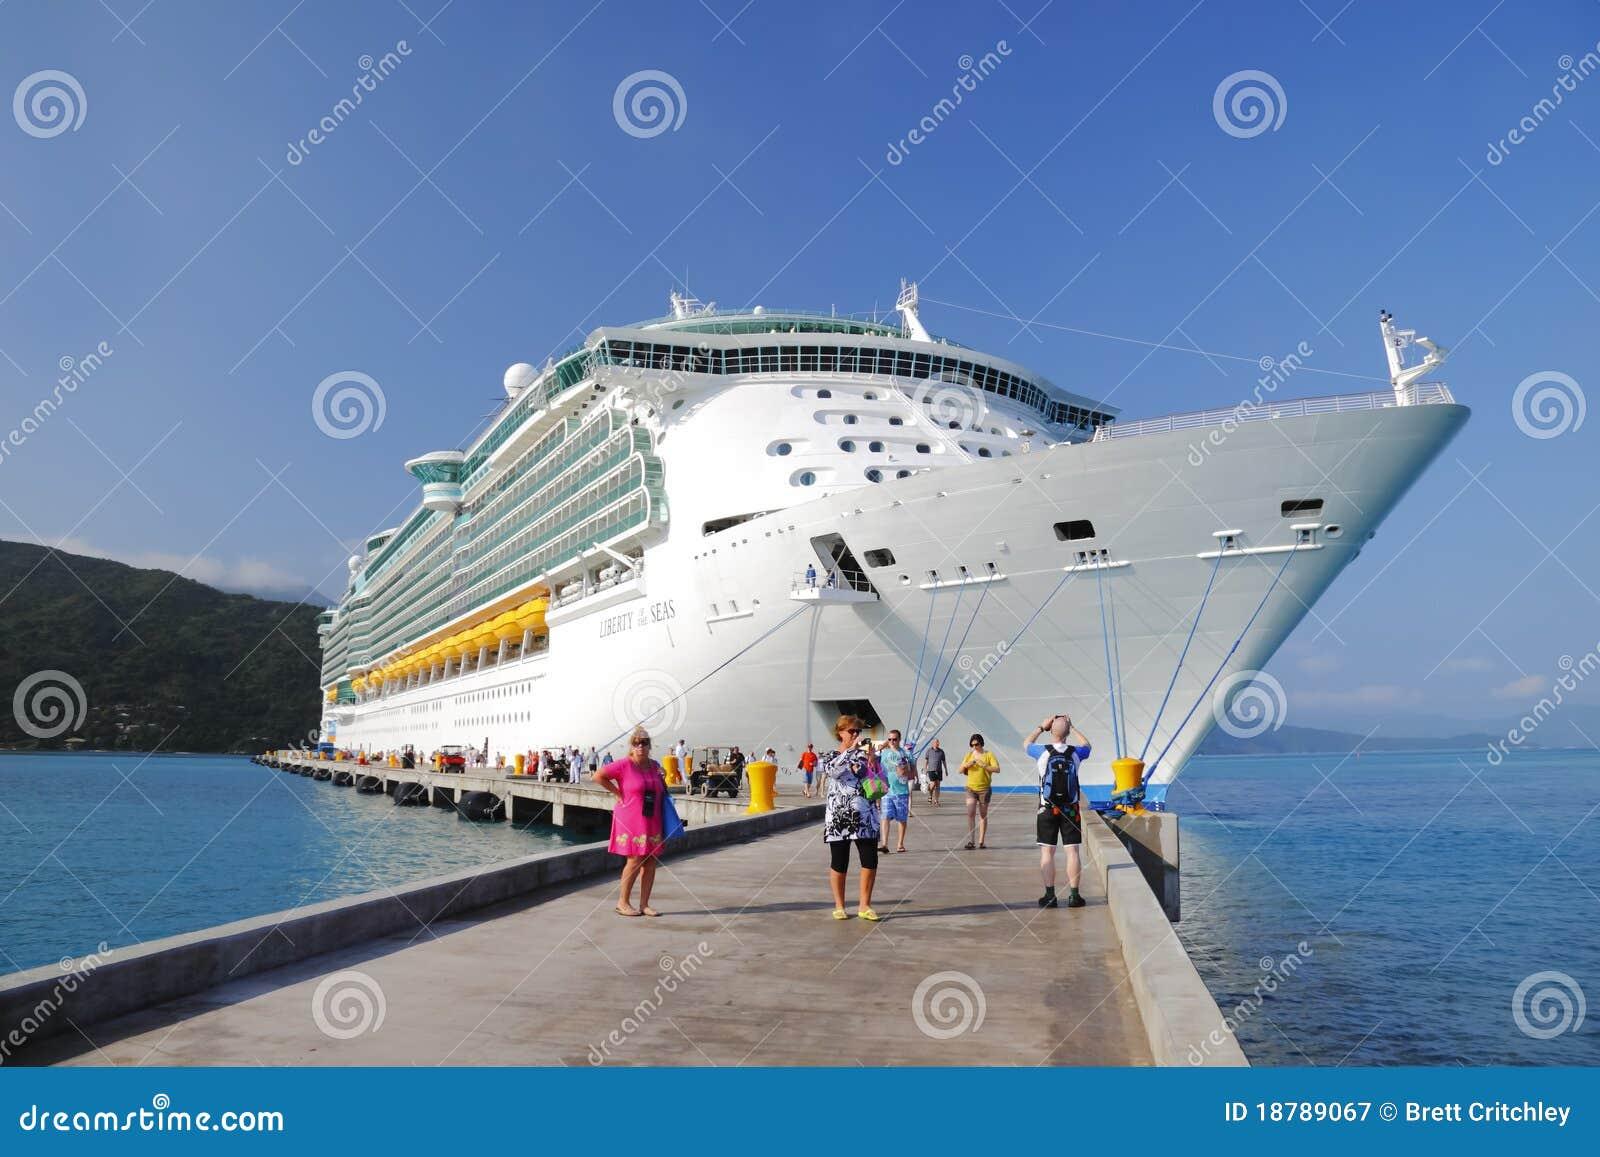 Barco de cruceros el Caribe Haití